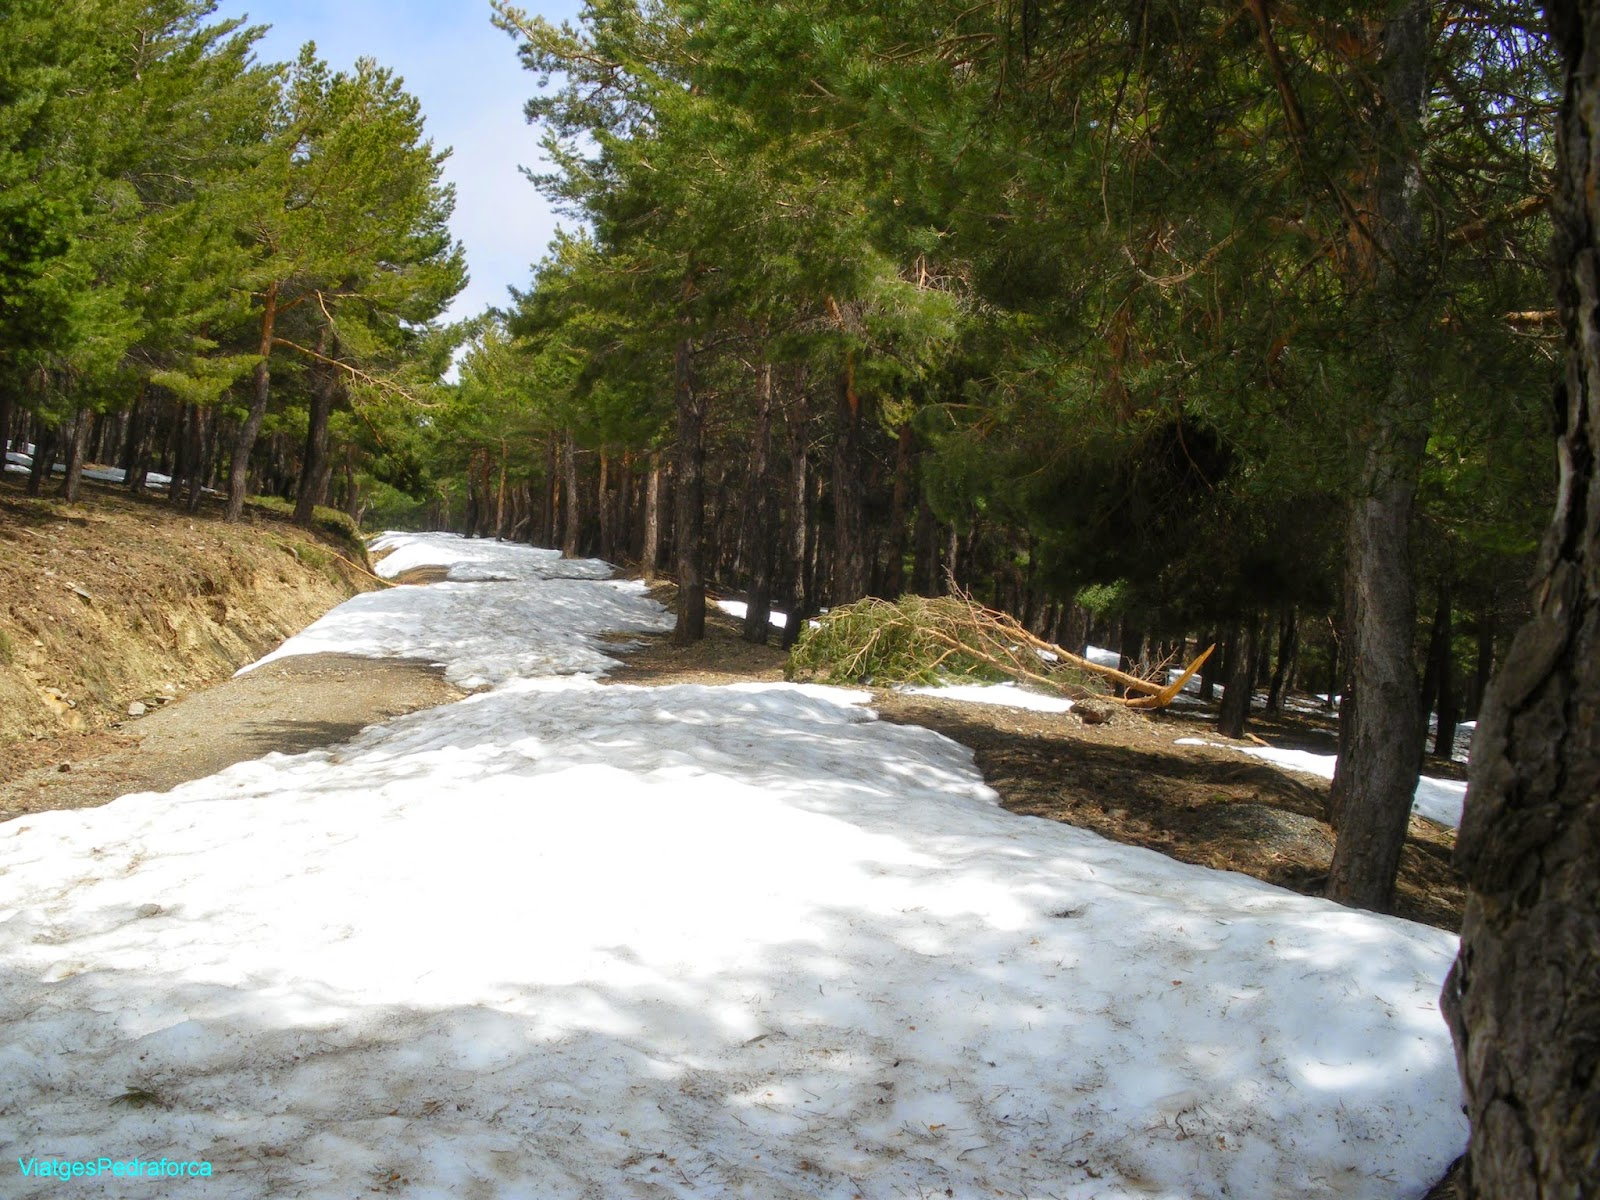 Hoya del Portillo Alpujarra Granada Sierra Nevada Barranco del Poqueira Andalucia